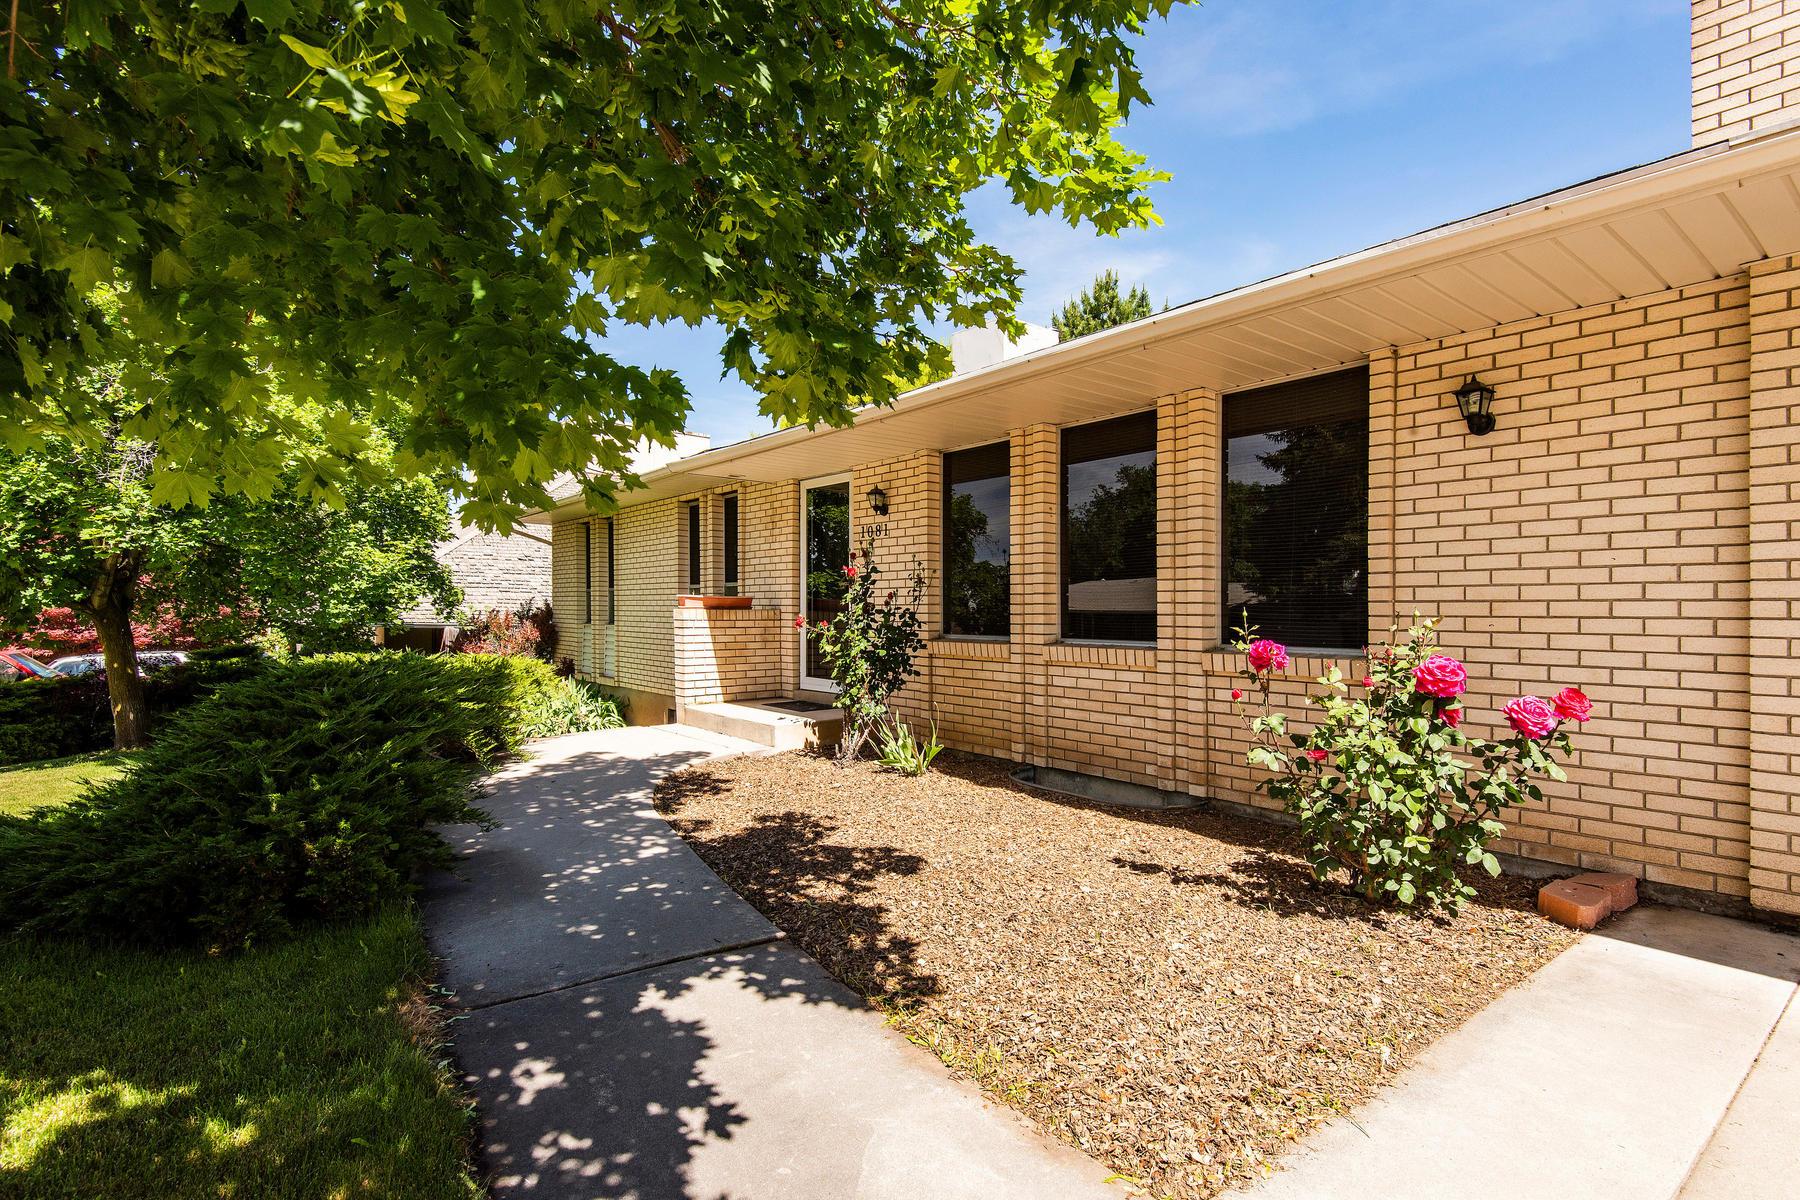 Single Family Homes için Satış at In the Heart of Springville 1081 East 50 North, Springville, Utah 84663 Amerika Birleşik Devletleri